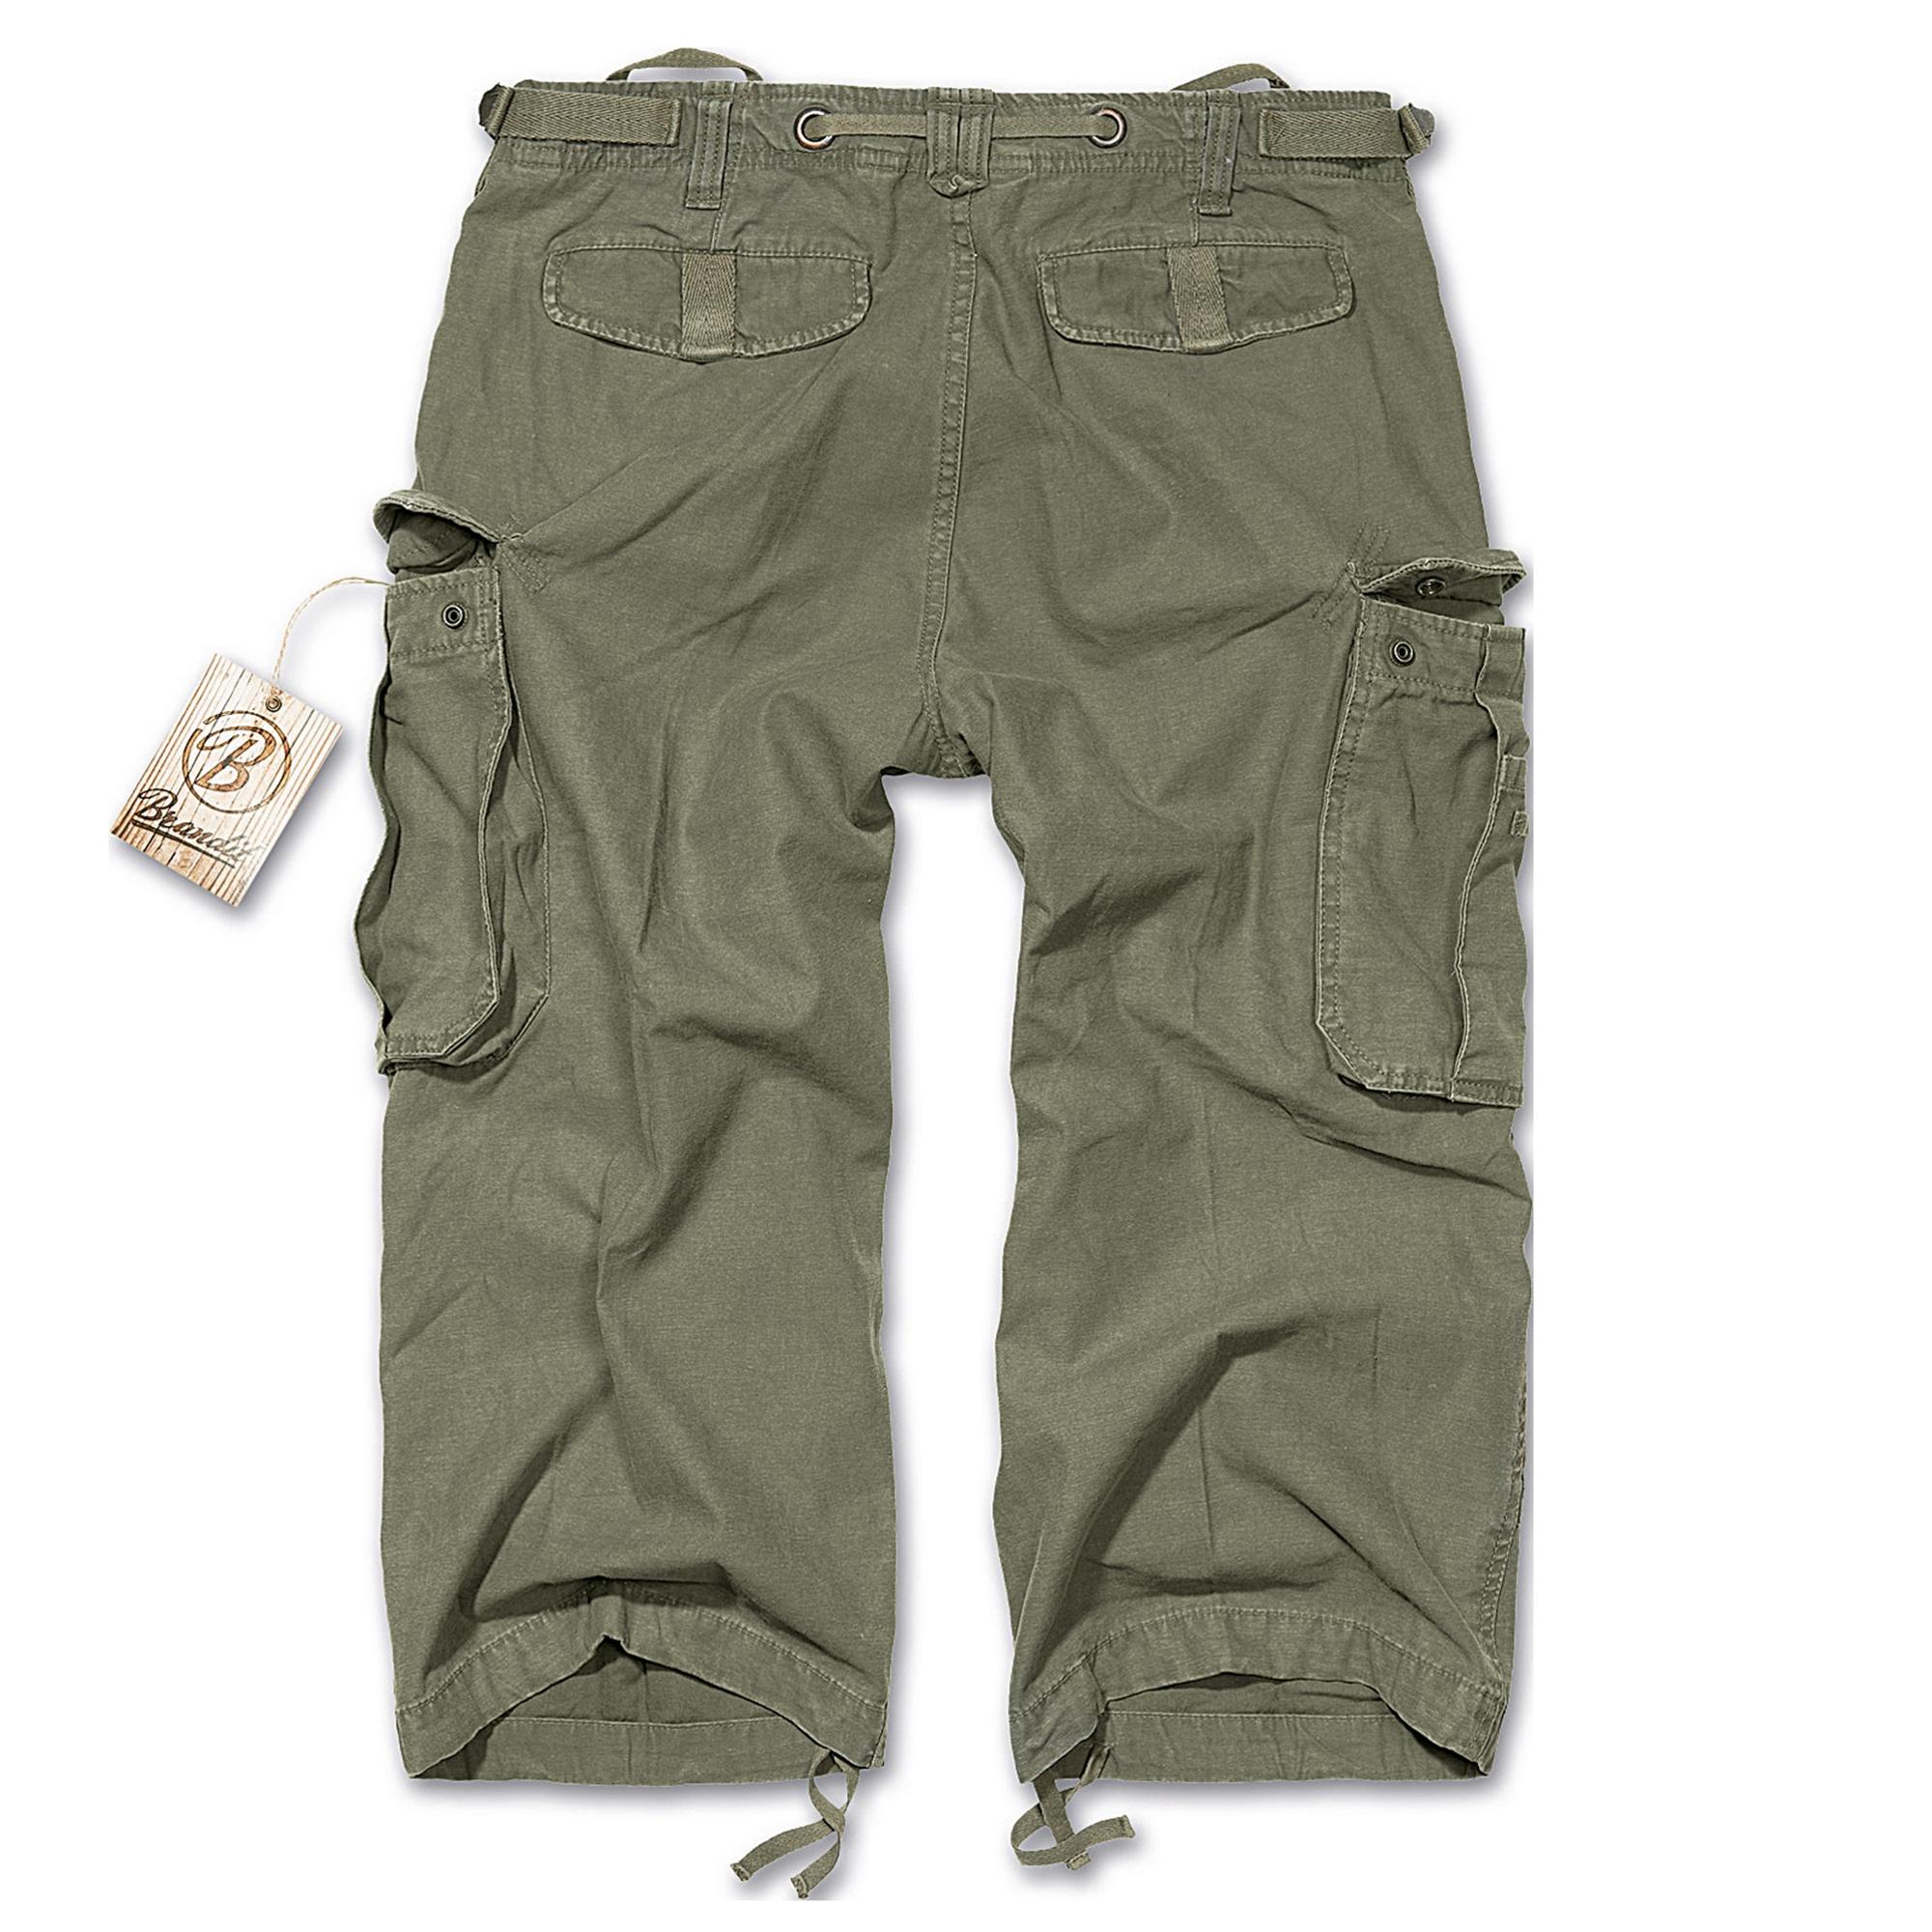 Brandit-Industry-3-4-Herren-Cargo-Shorts-Bermuda-Kurze-Hose-Short-US-Army-Ranger Indexbild 3